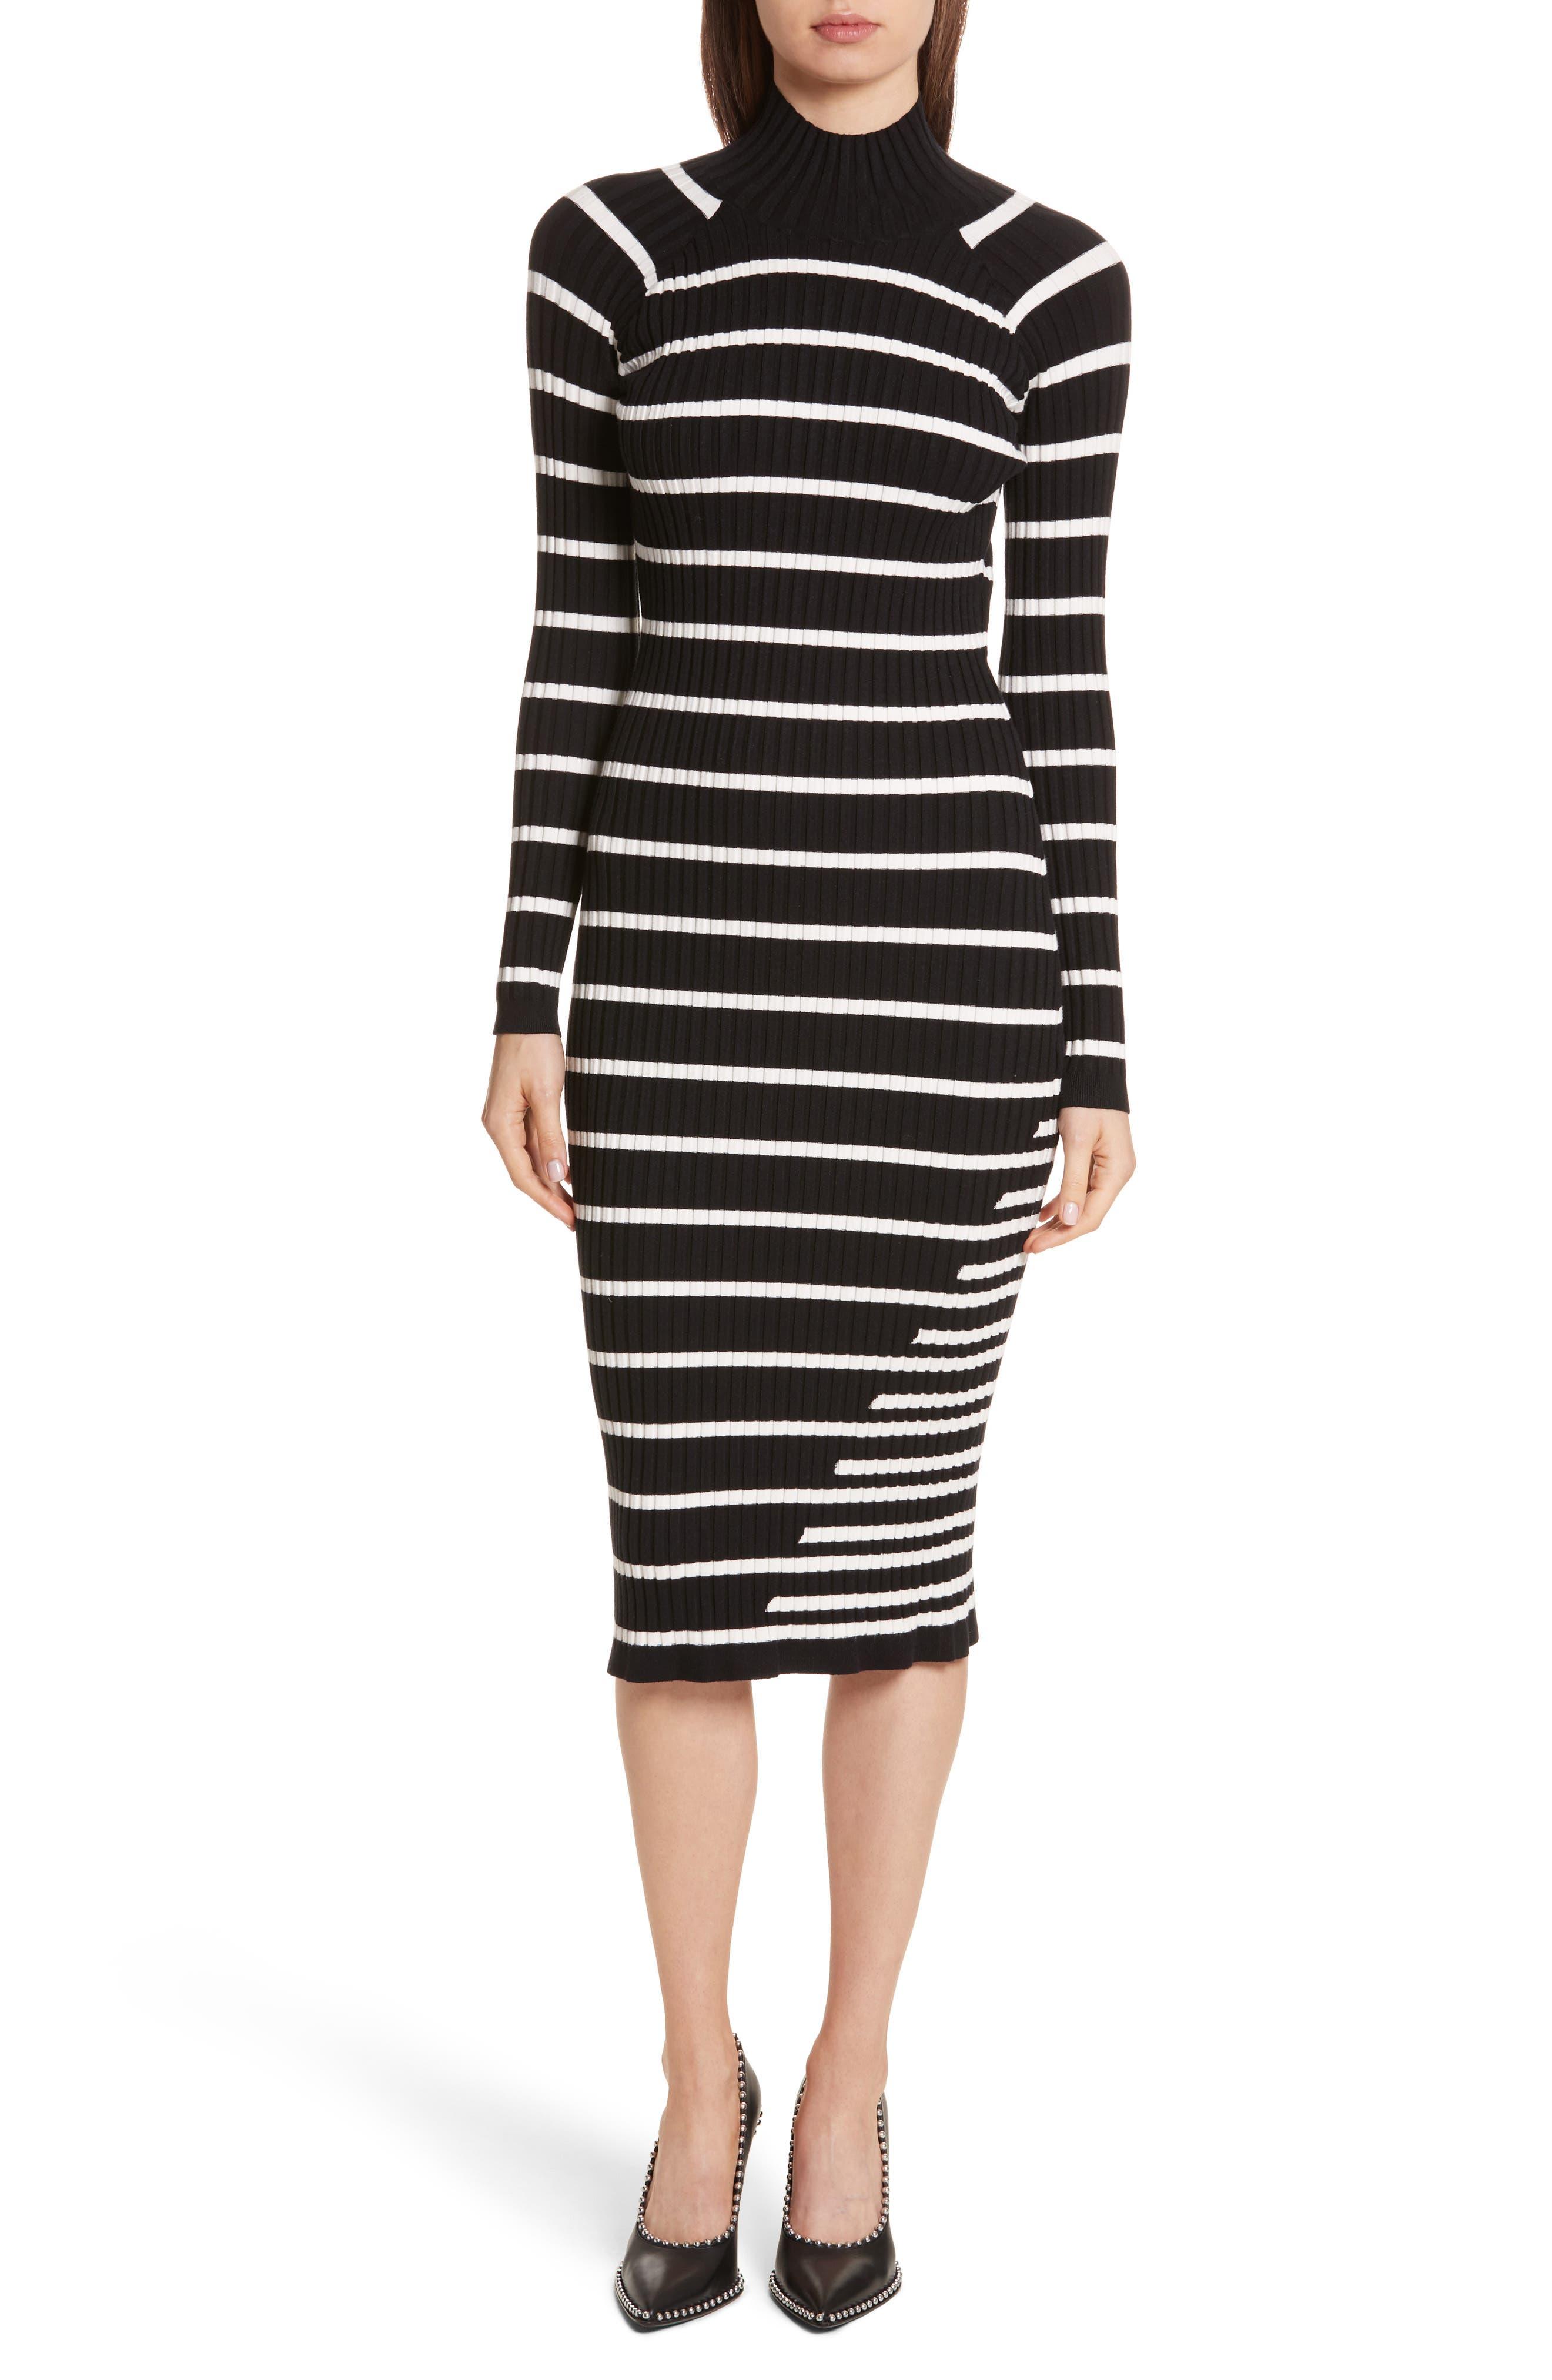 Main Image - T by Alexander Wang Stripe Knit Turtleneck Dress